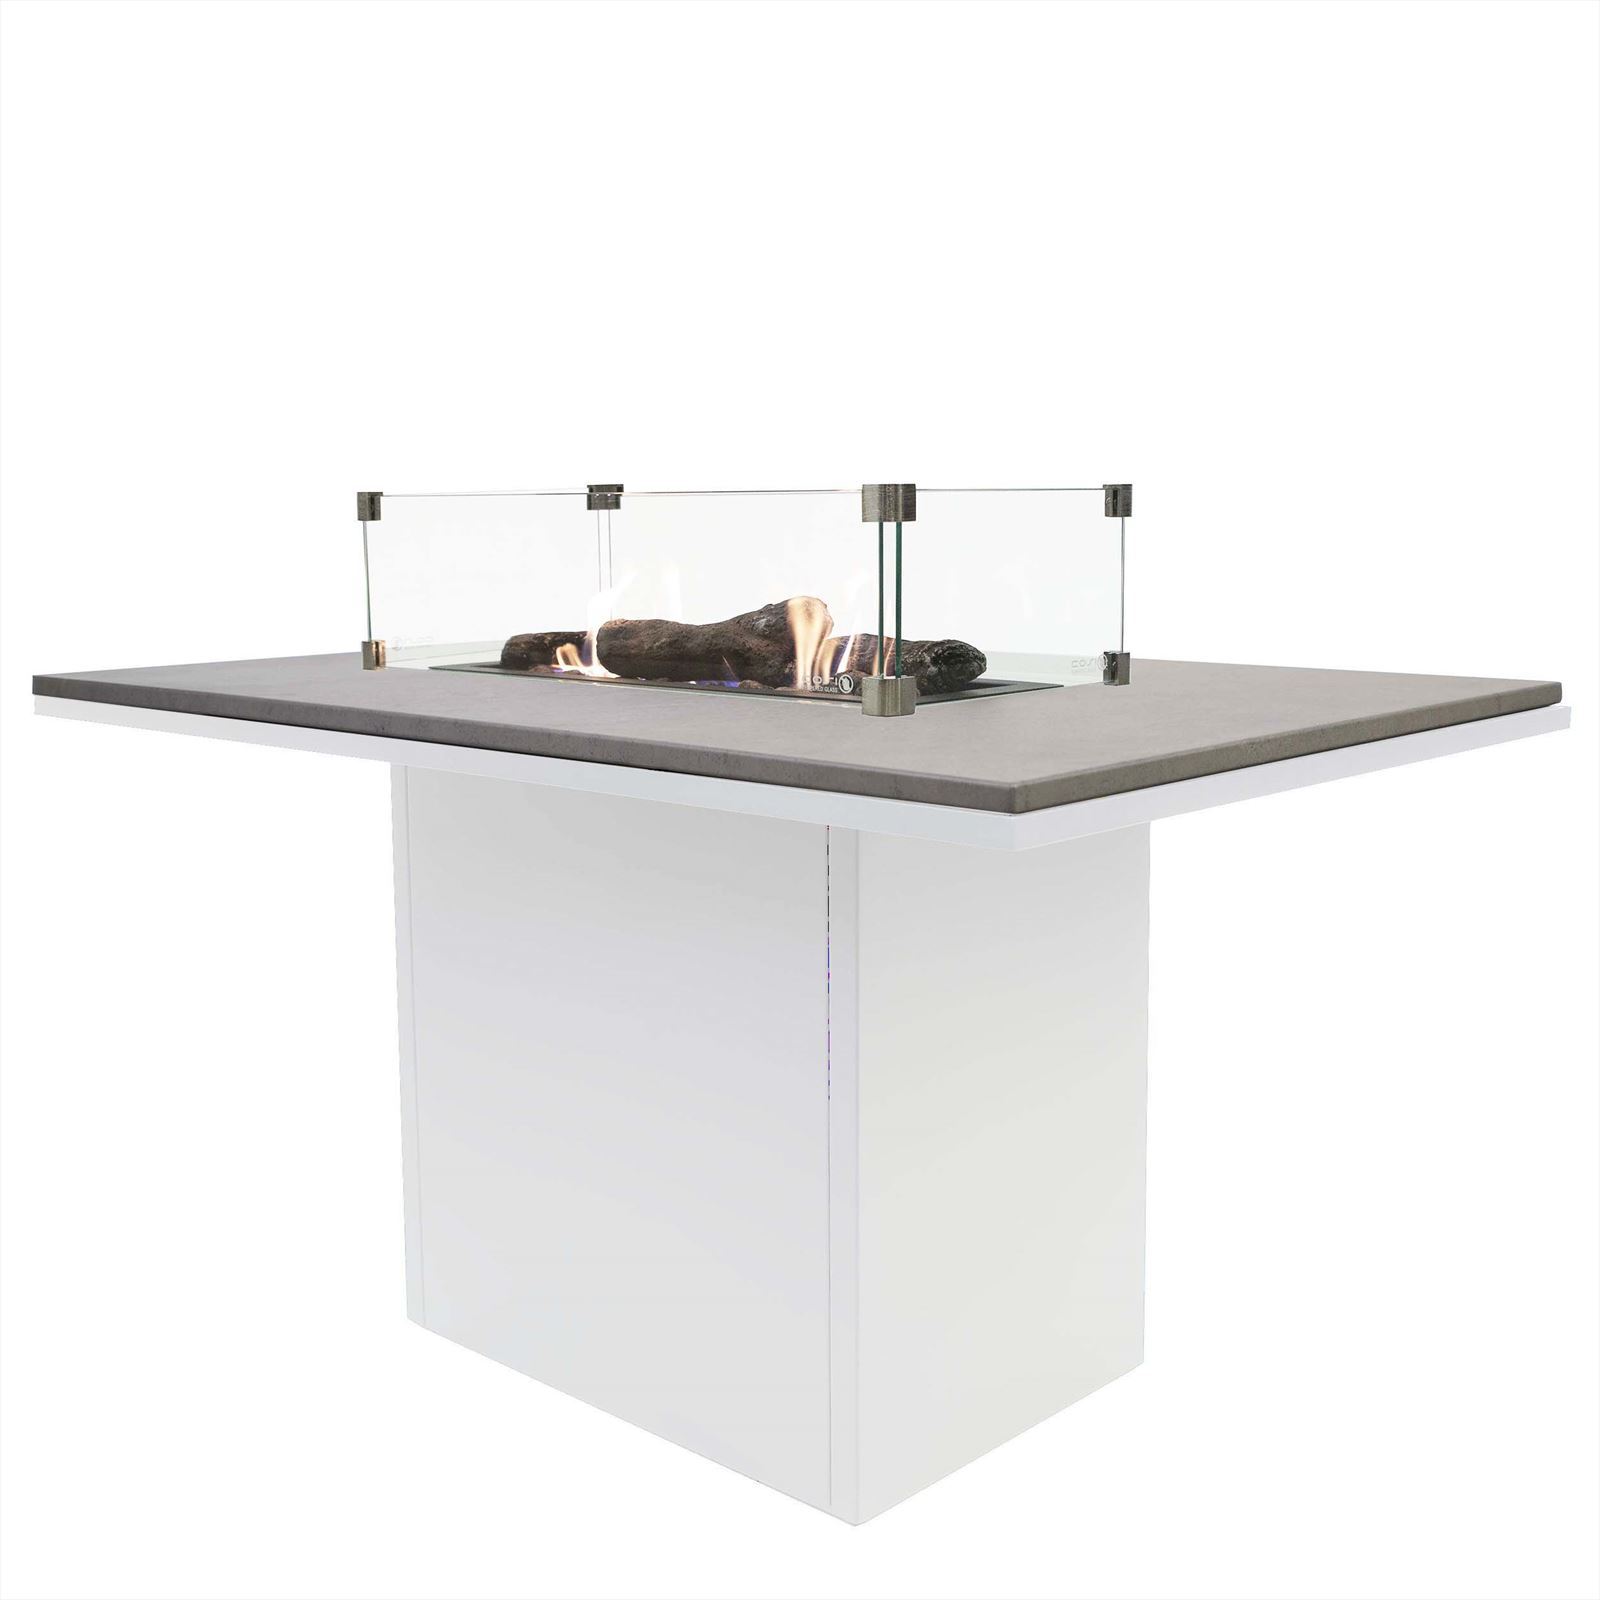 Cosi Fires vuurtafels en gaslantaarns Cosiloft relax dining vuurtafel, white frame, grey top, afm. 120 x 80 x 67 cm